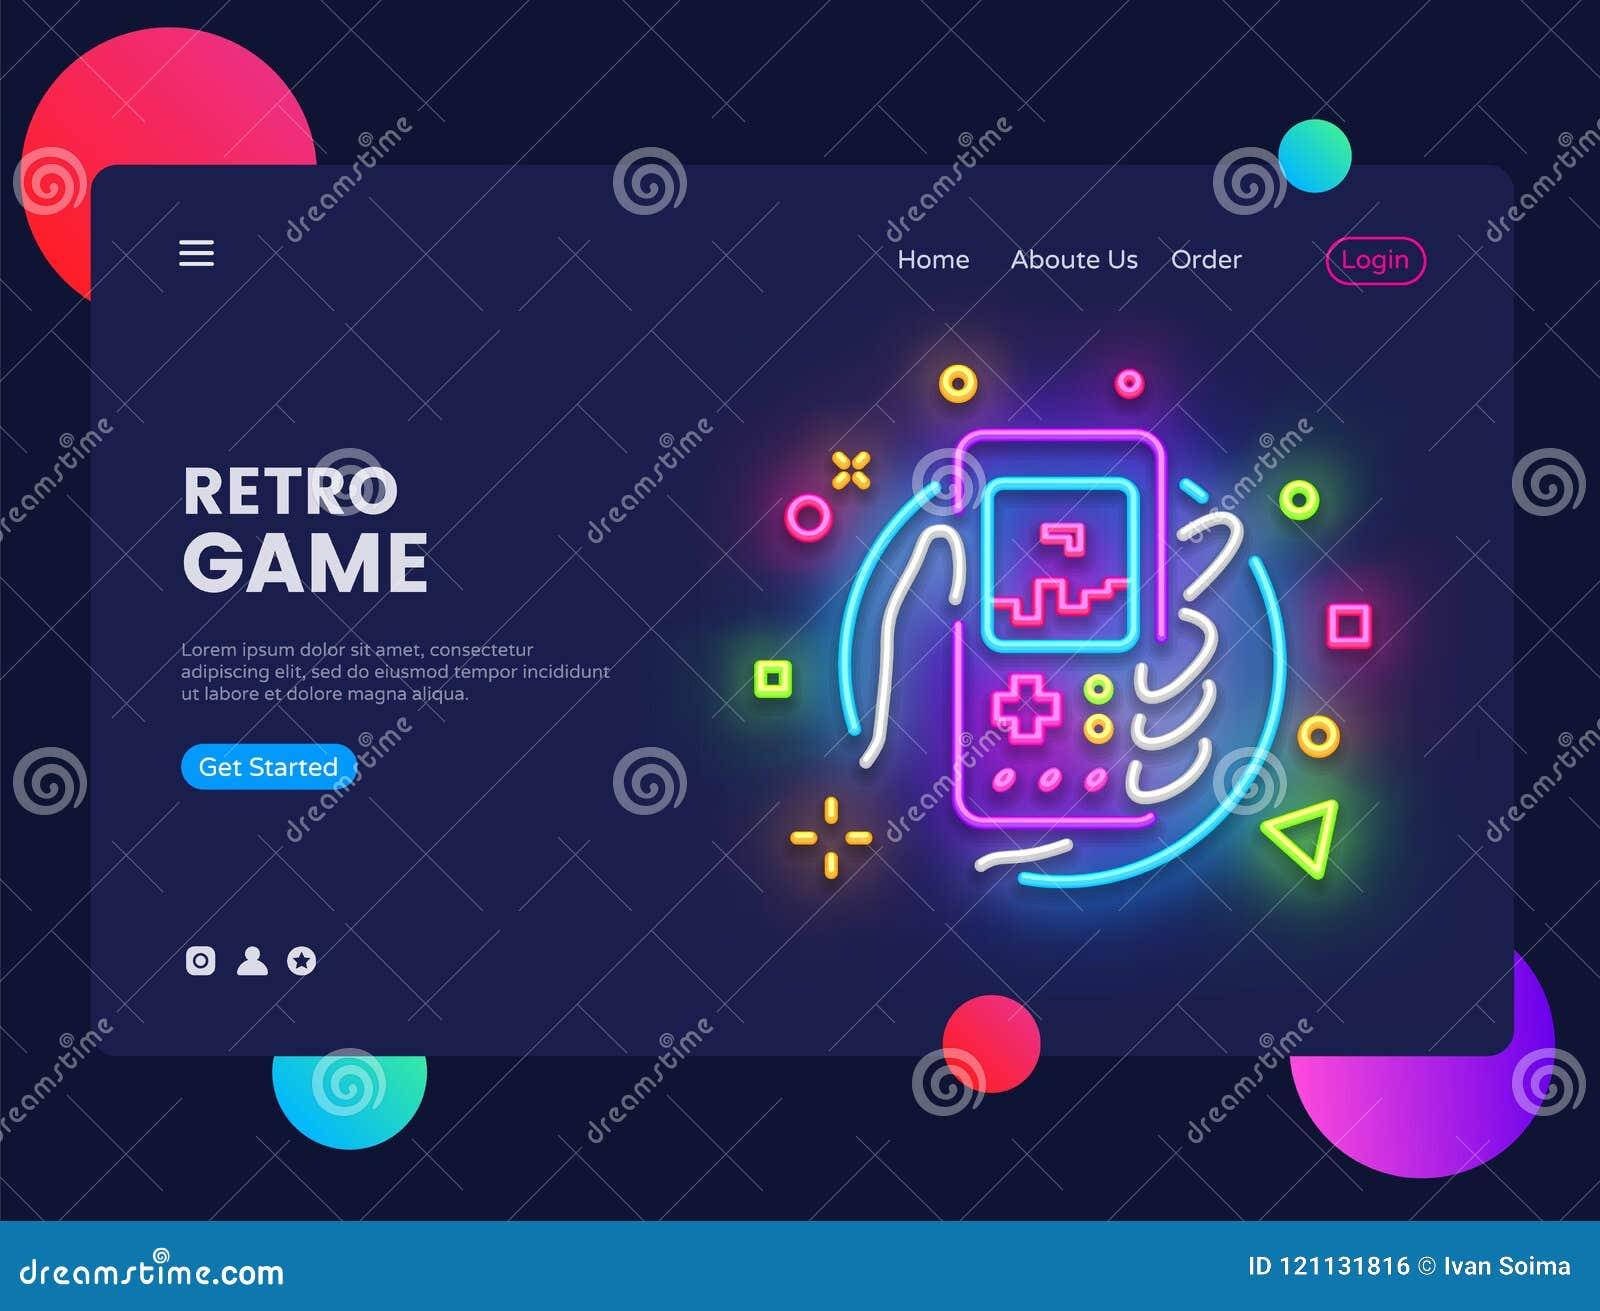 Retro Games Website Concept Banner Vector Design Template Retro Game Light Banner In Neon Style Retro Geek Gaming Stock Vector Illustration Of Horizontal Icon 121131816